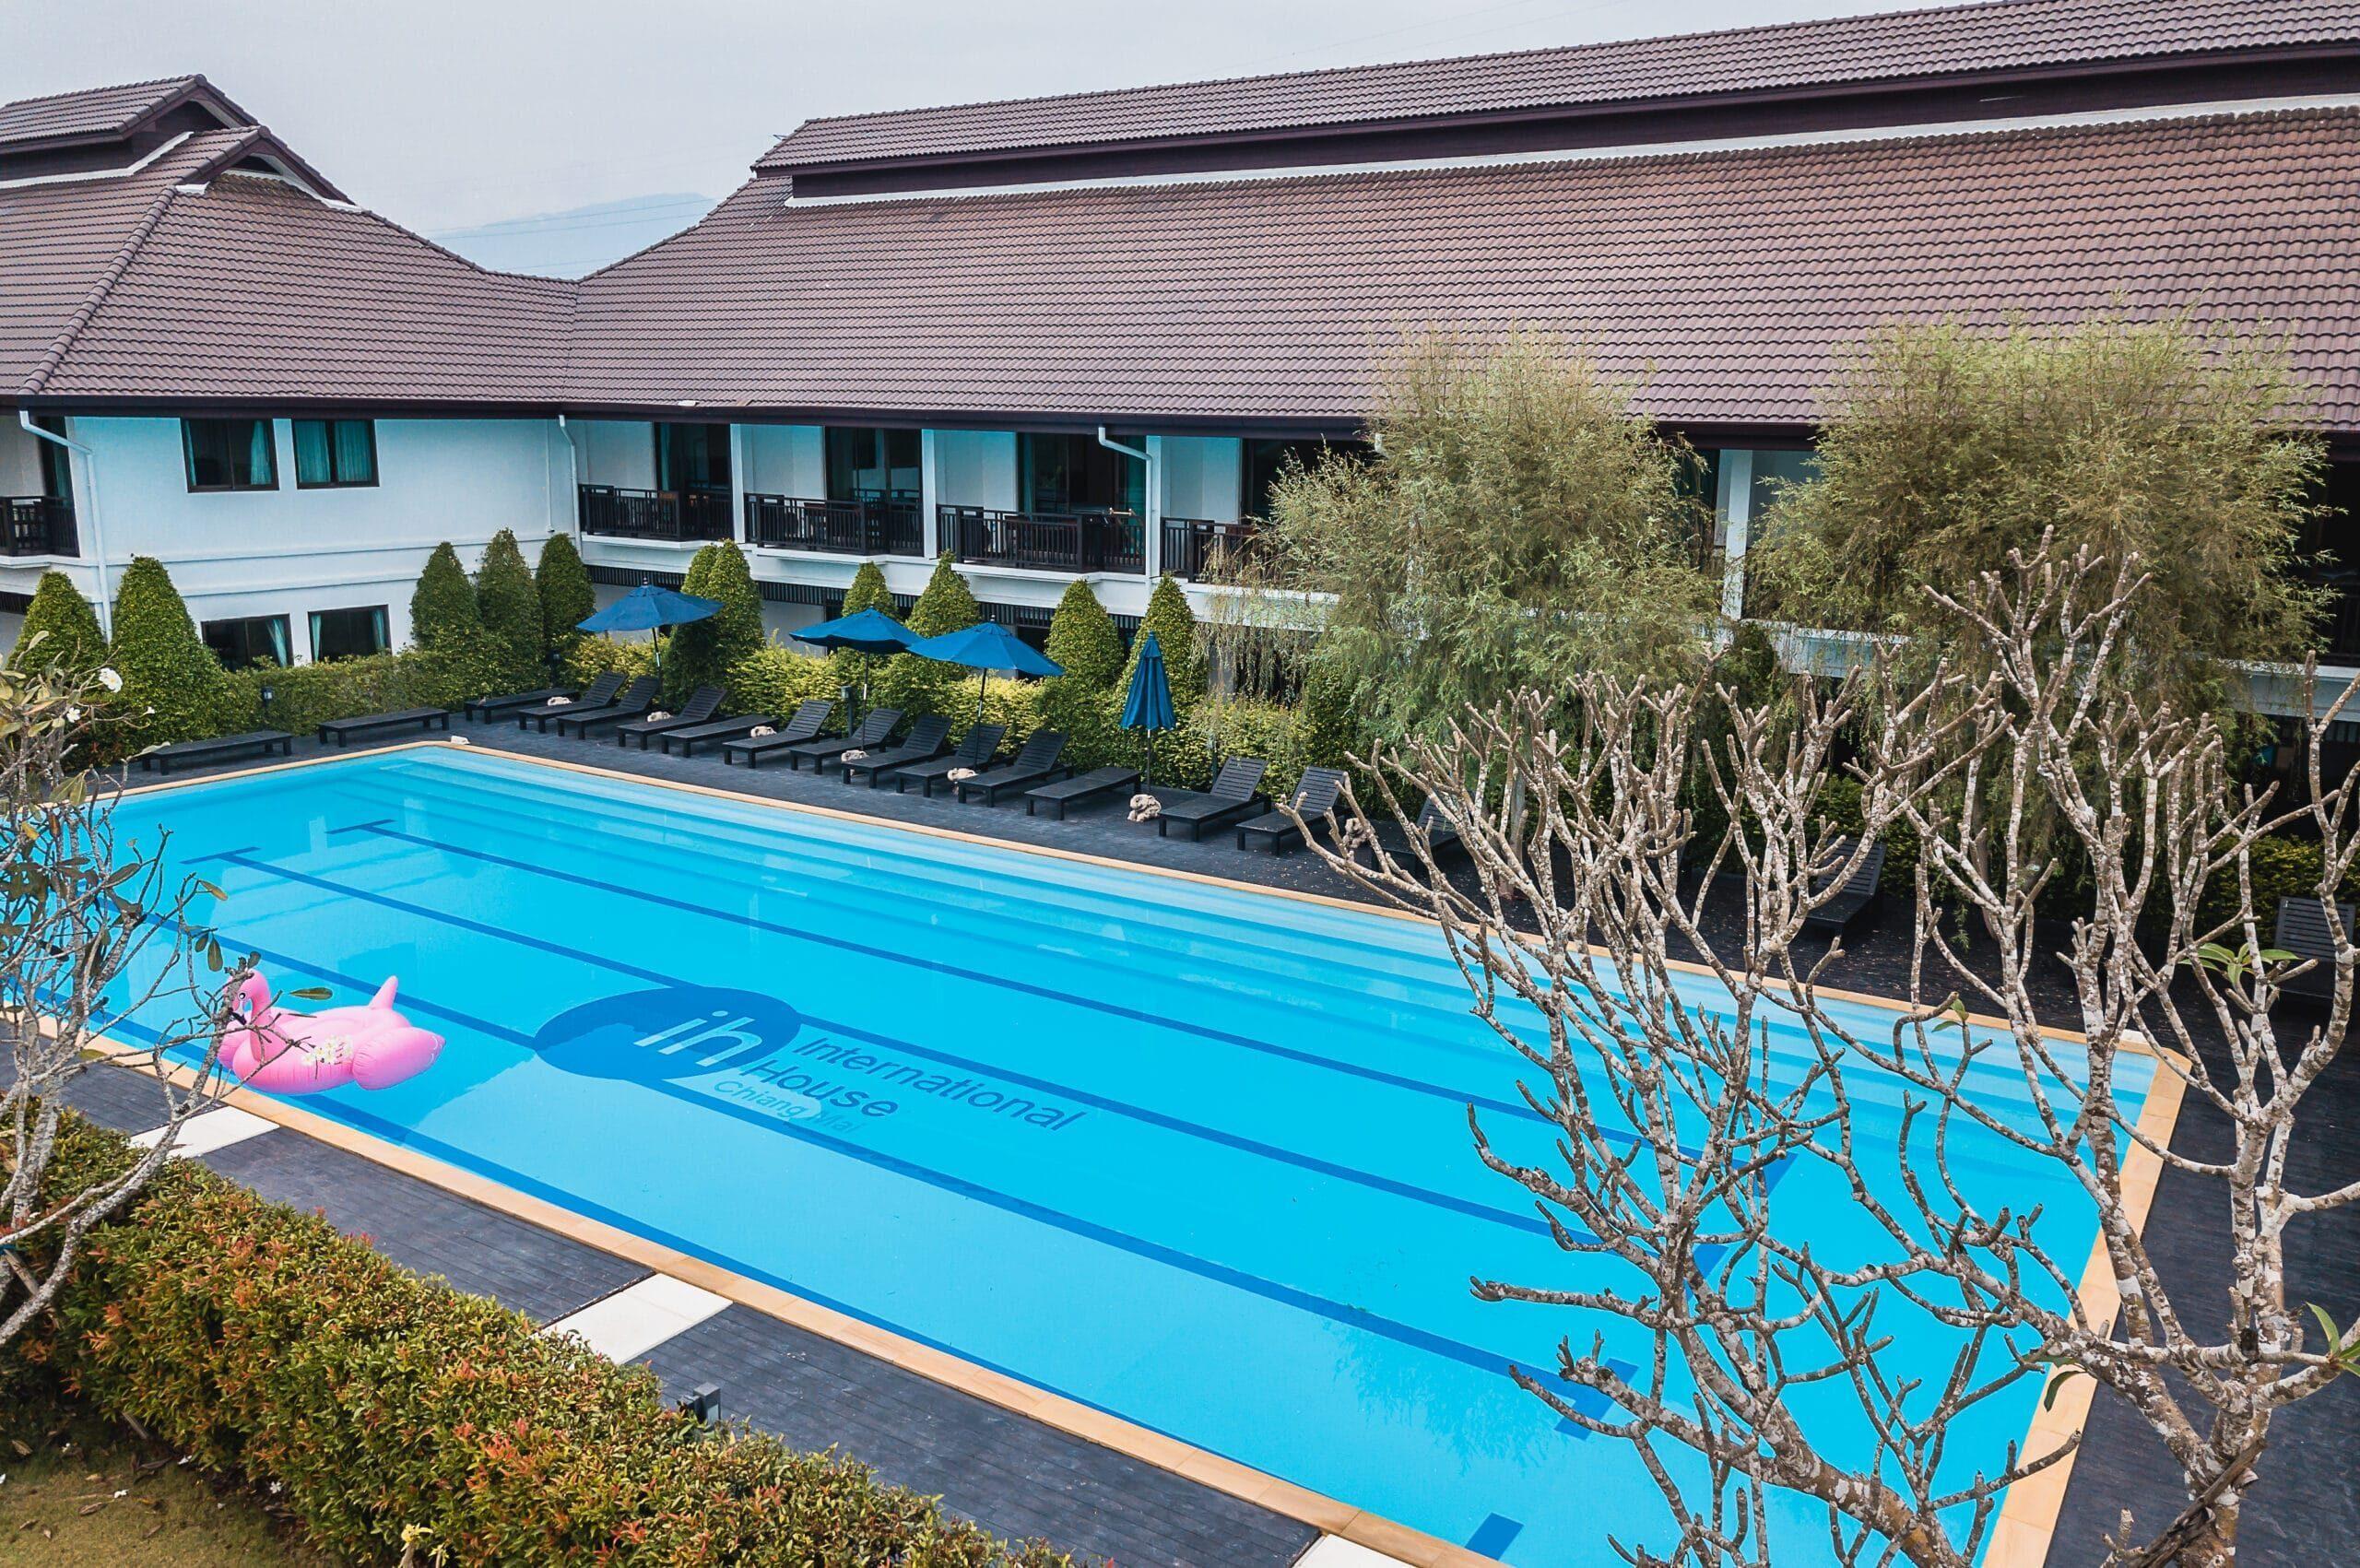 A Drone Shot - 4 - Accommodation + Pool - IH Chiang Mai -